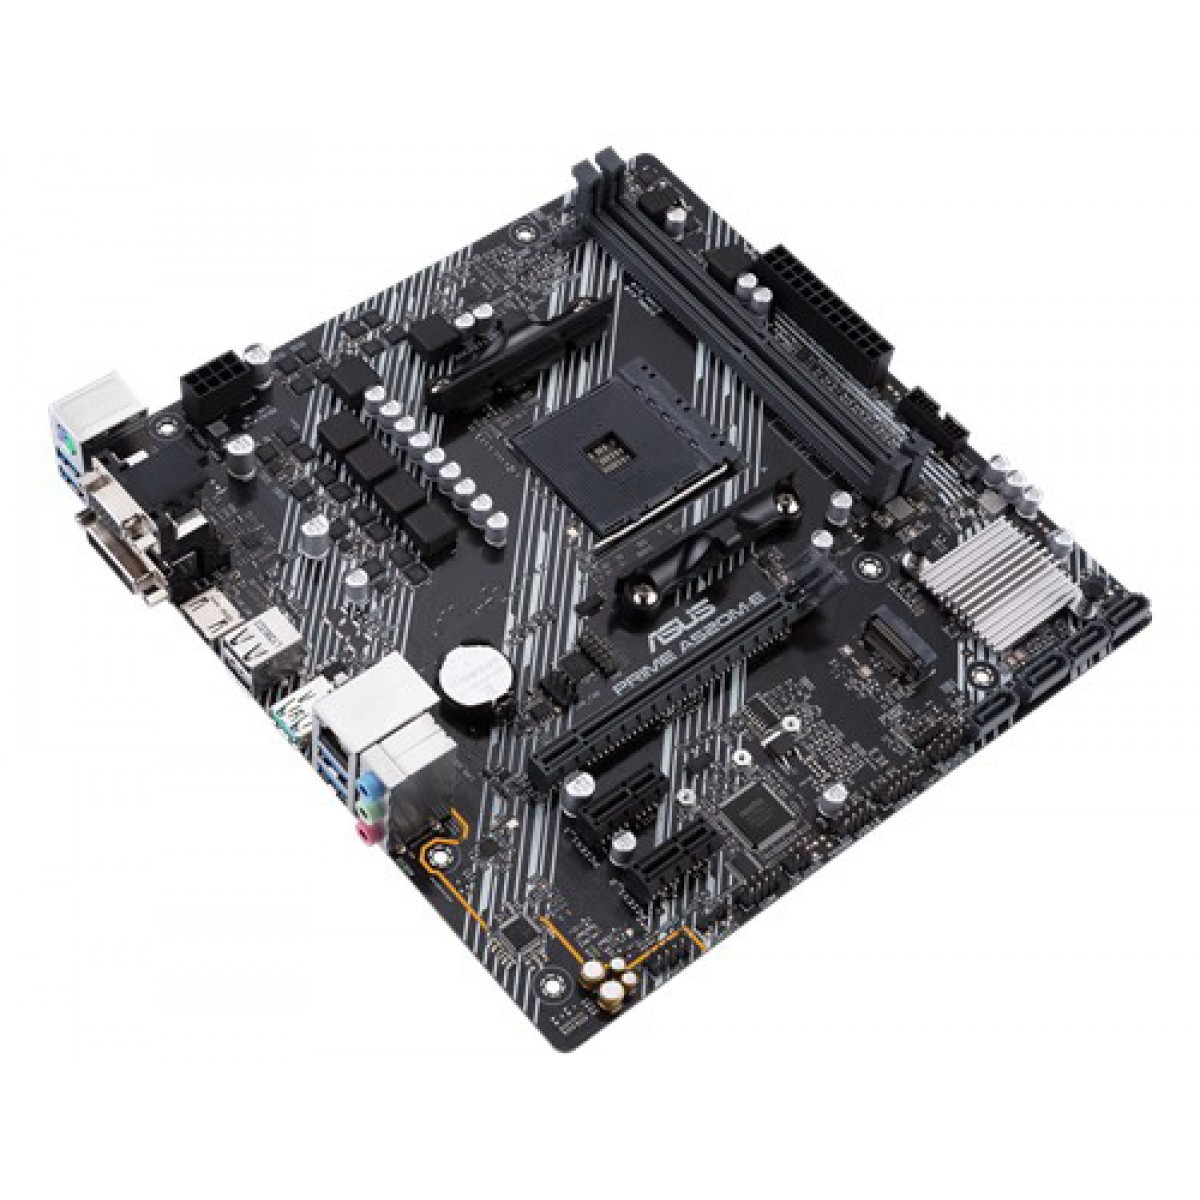 Placa Mãe Asus Prime A520M-E, Chipset A520, AMD AM4, mATX, DDR4